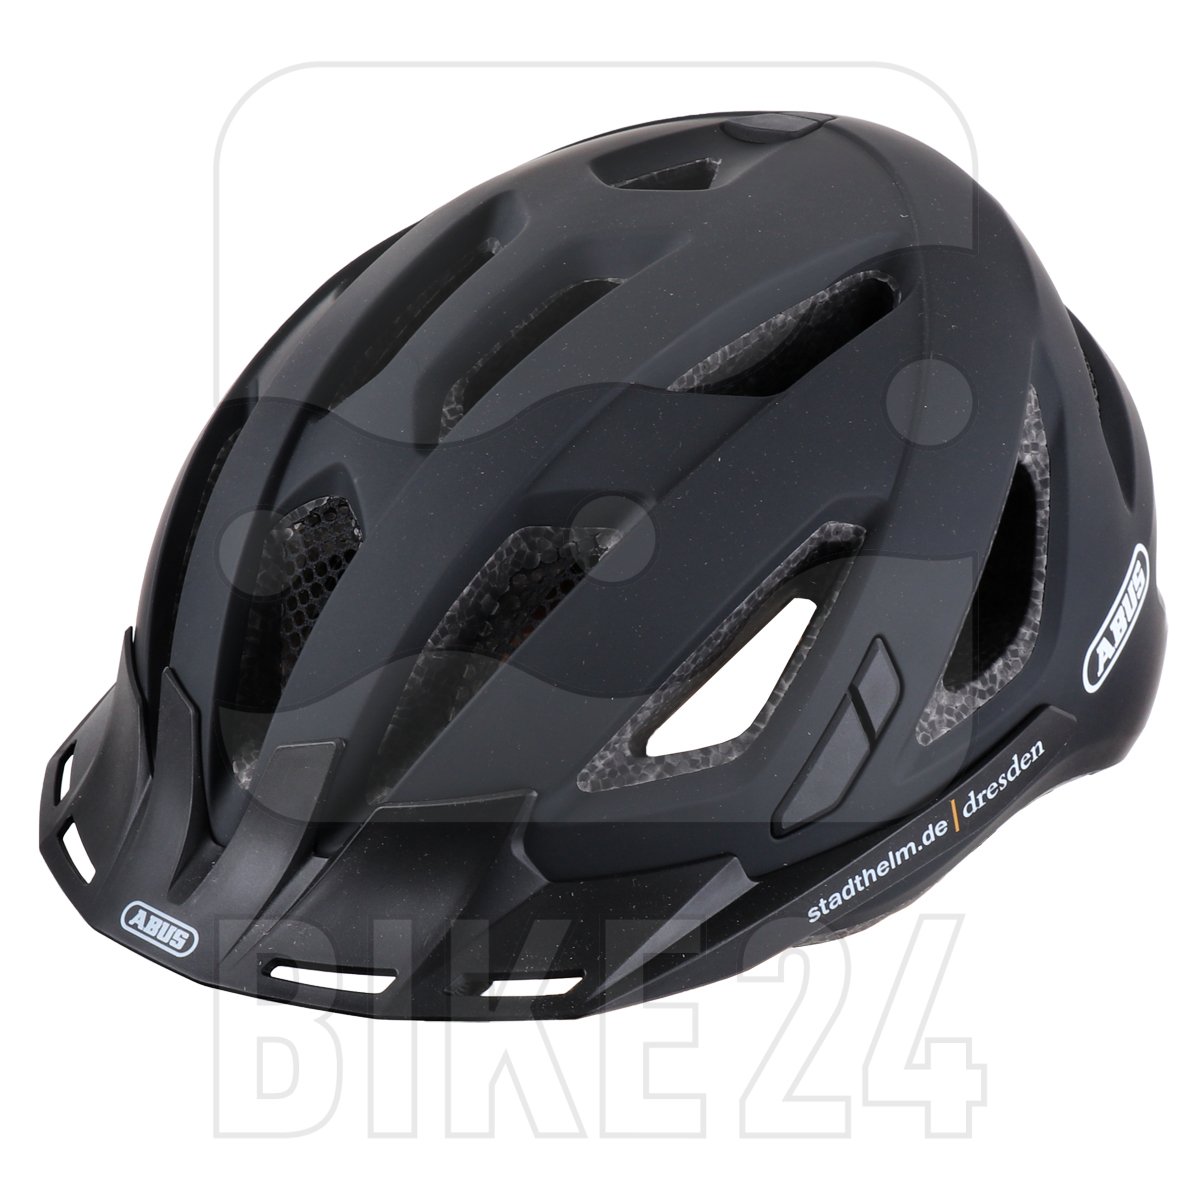 ABUS Stadthelm Urban-I 3.0 Dresden Helmet - black